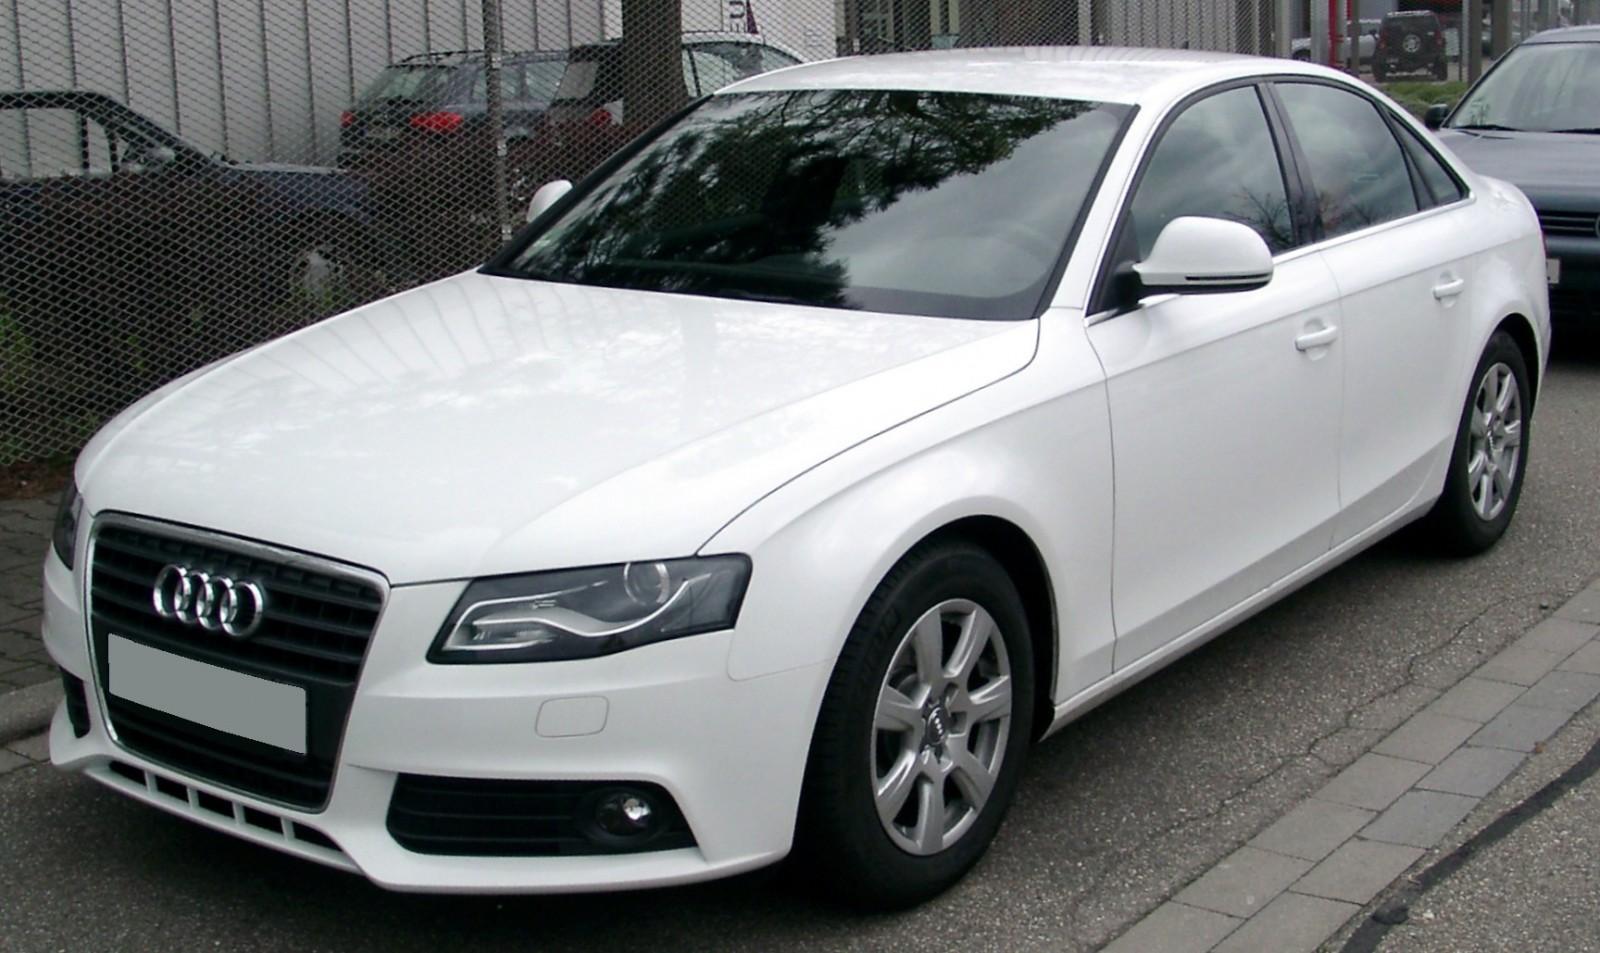 Audi A4, 2,0 TDI